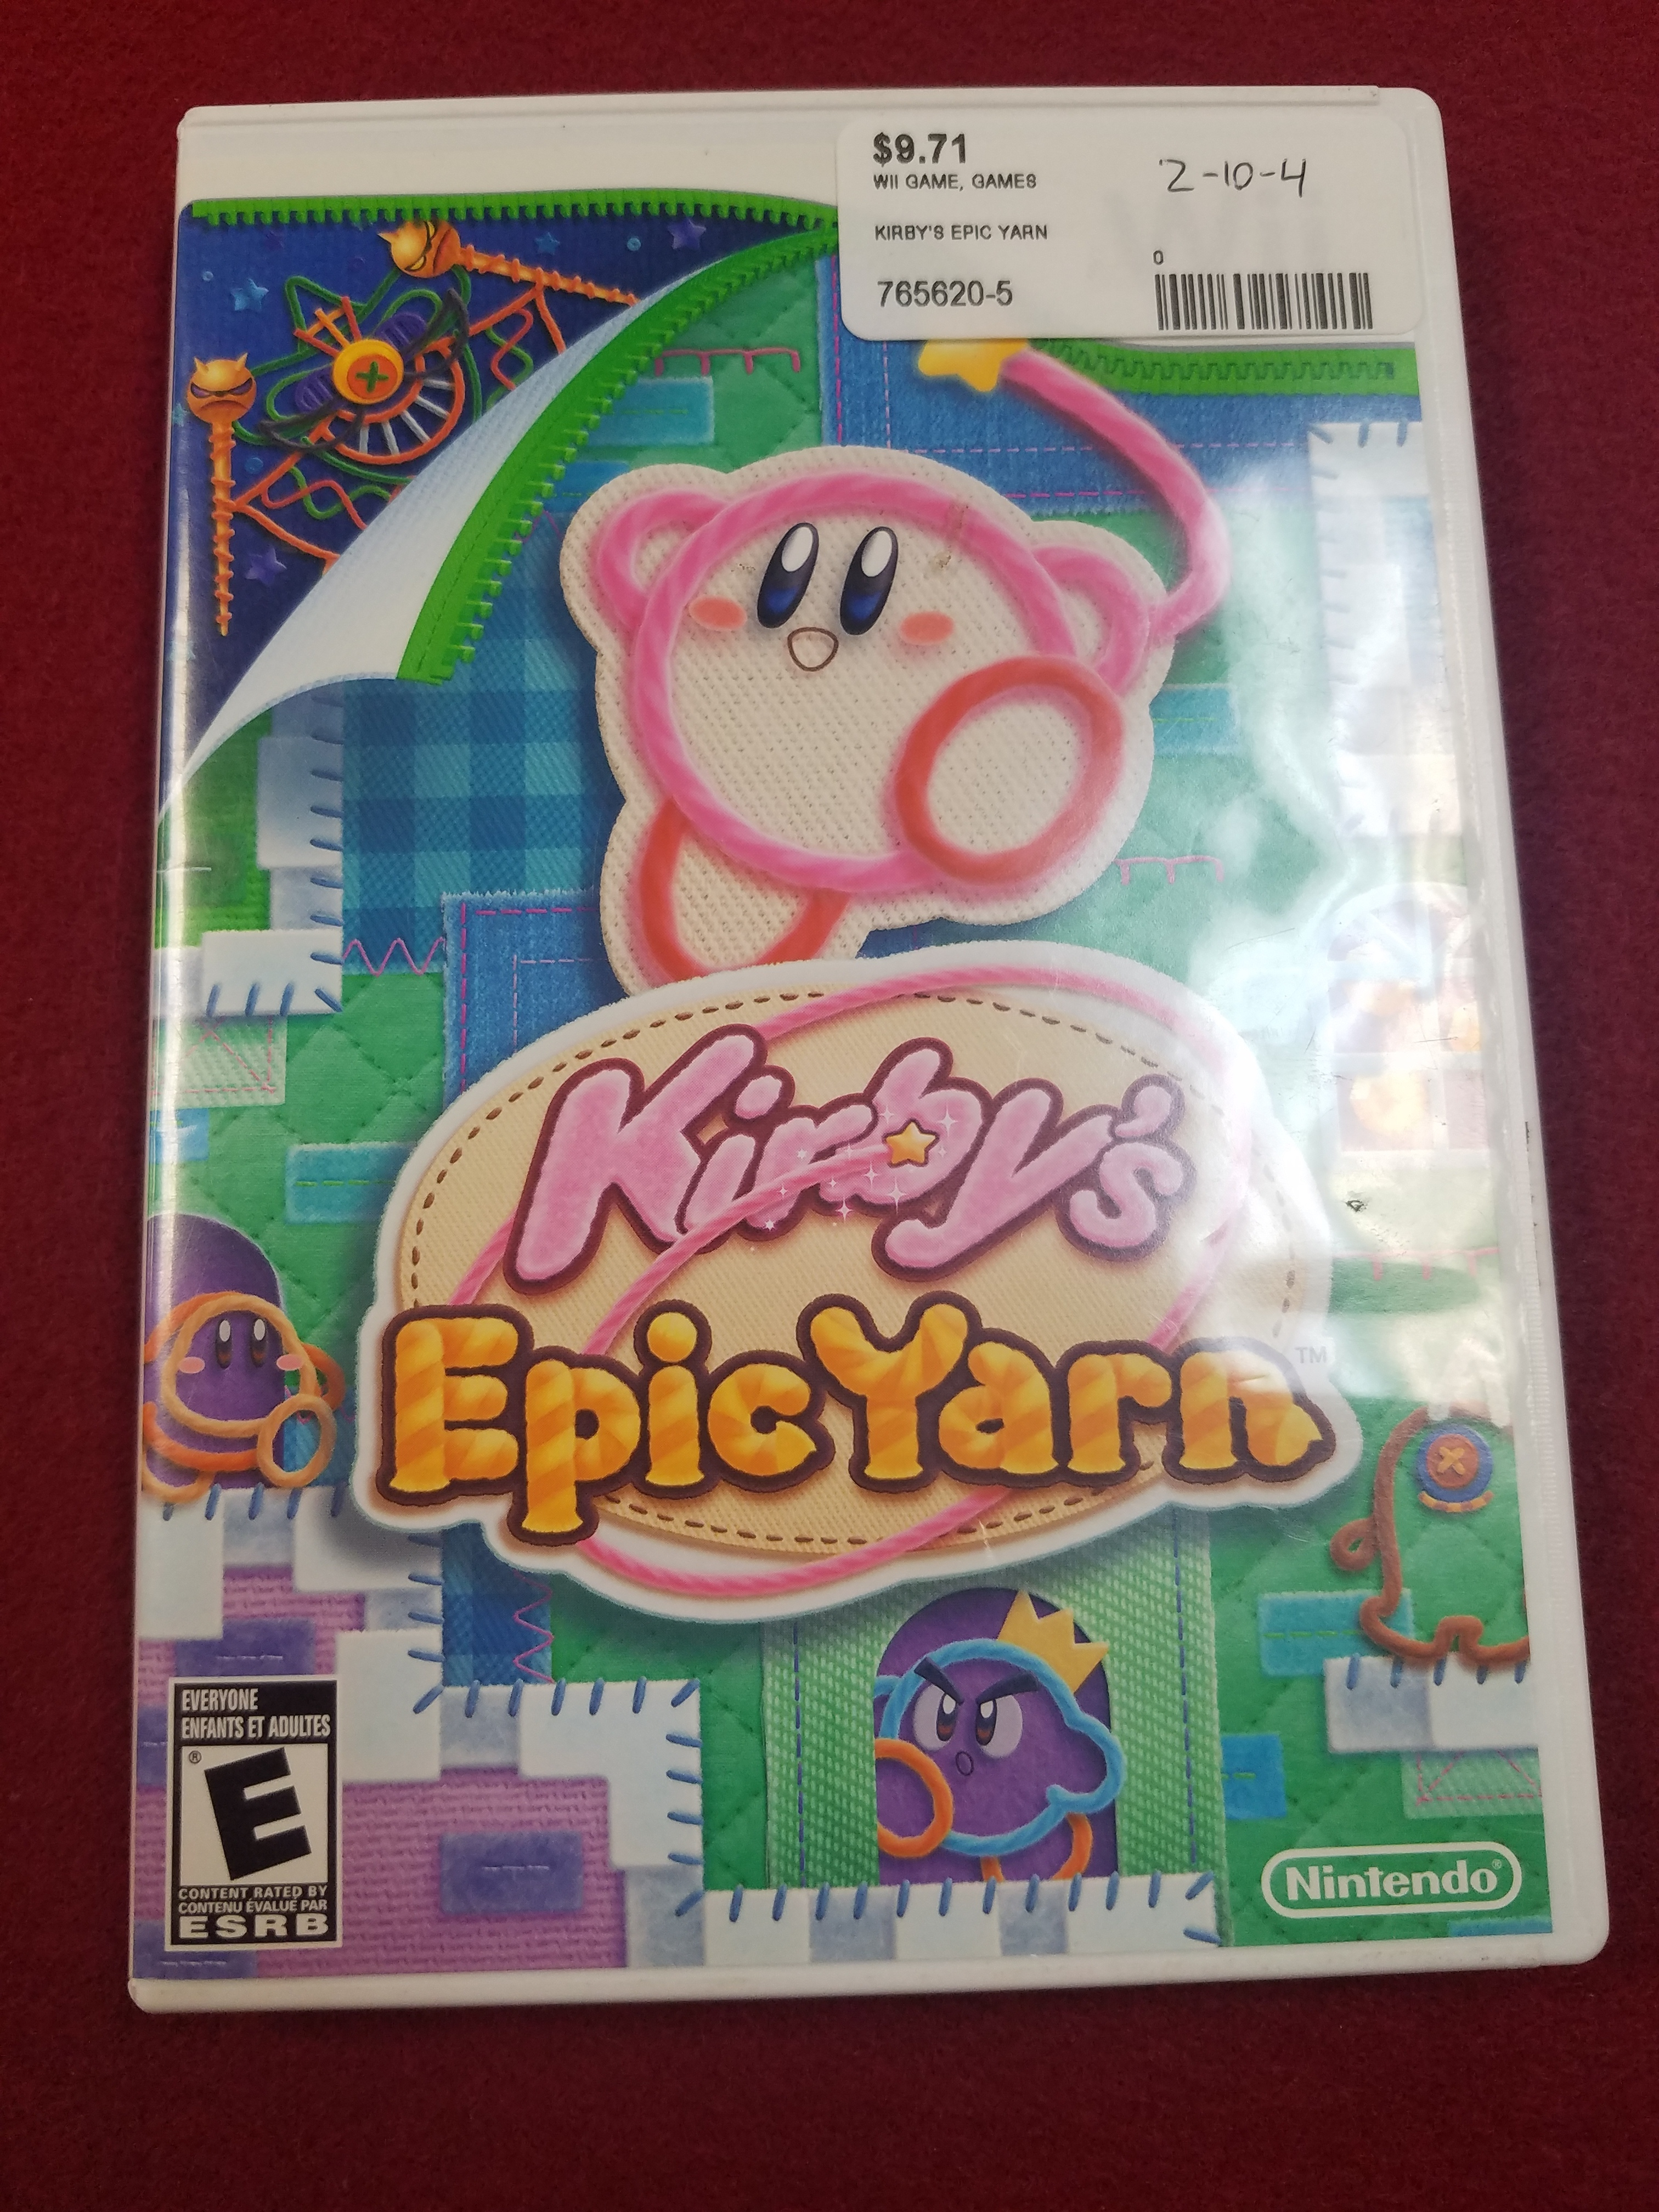 WII GAME - KIRBY'S EPIC YARN